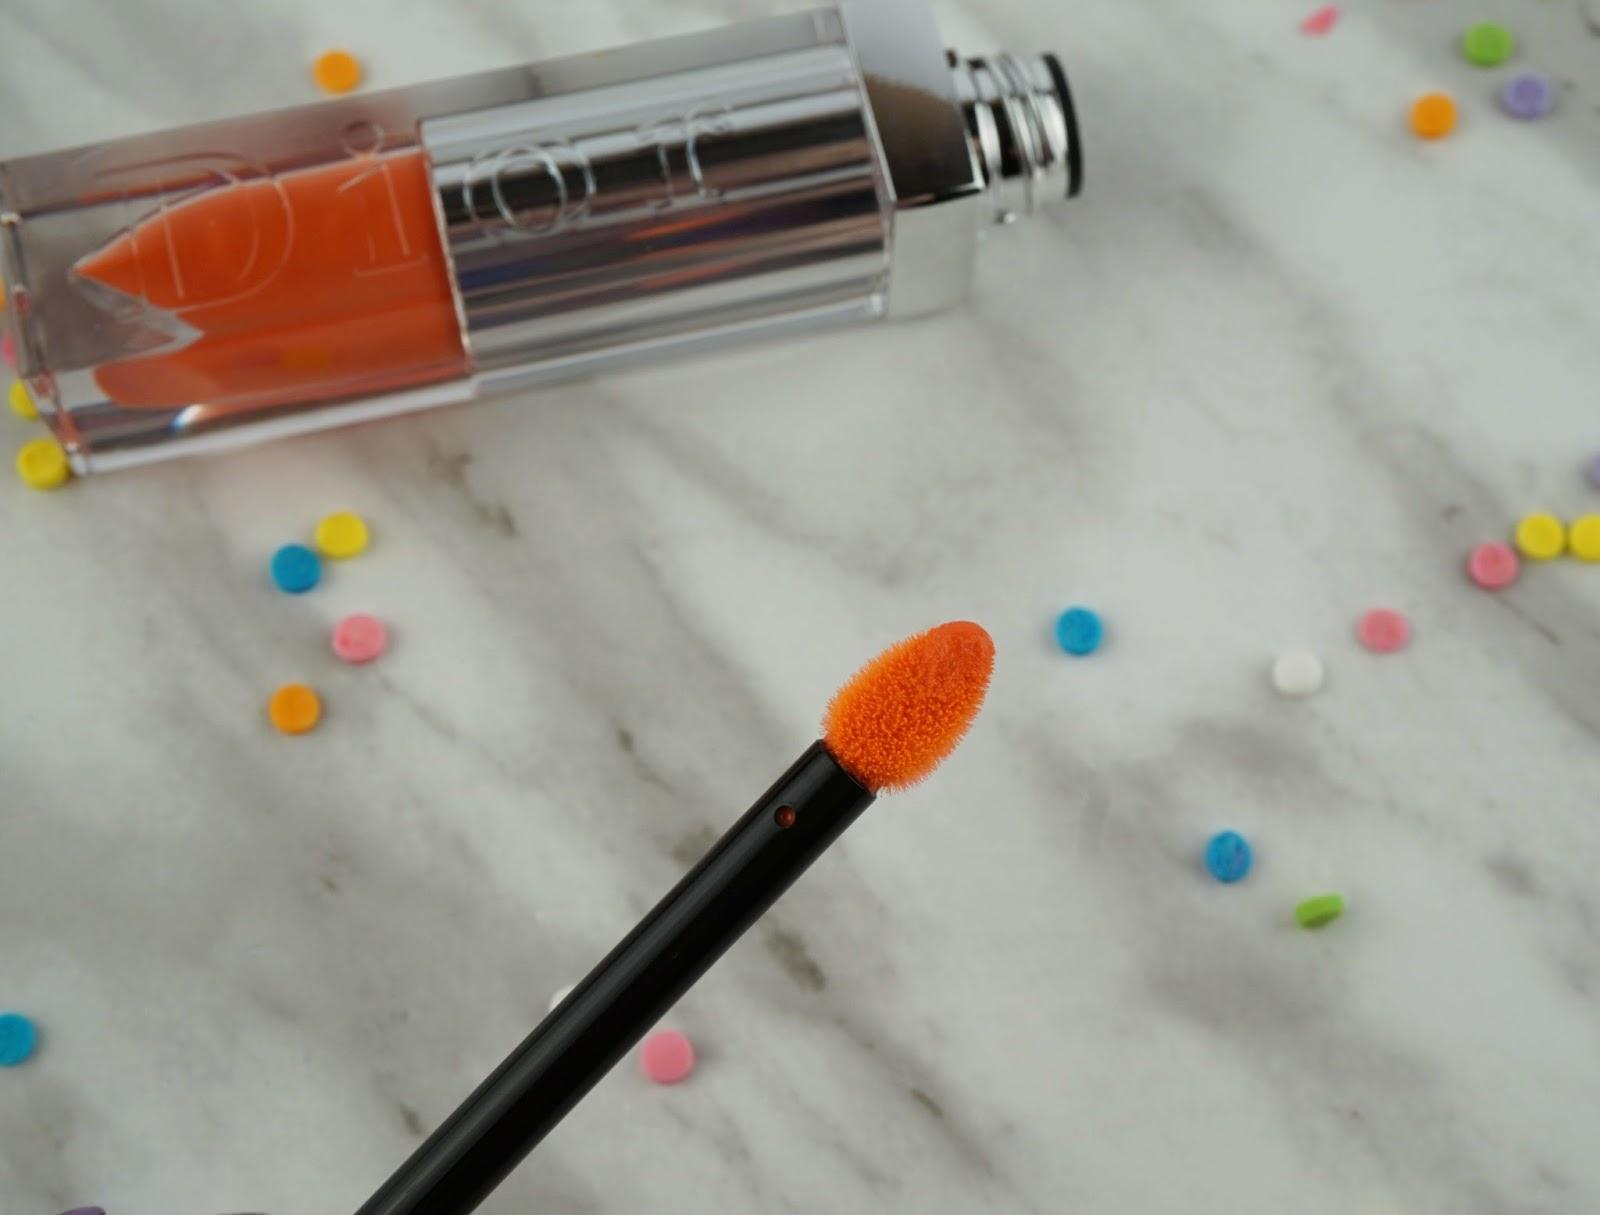 Dior Addict Milky Tint 356 Milky Peach swatch